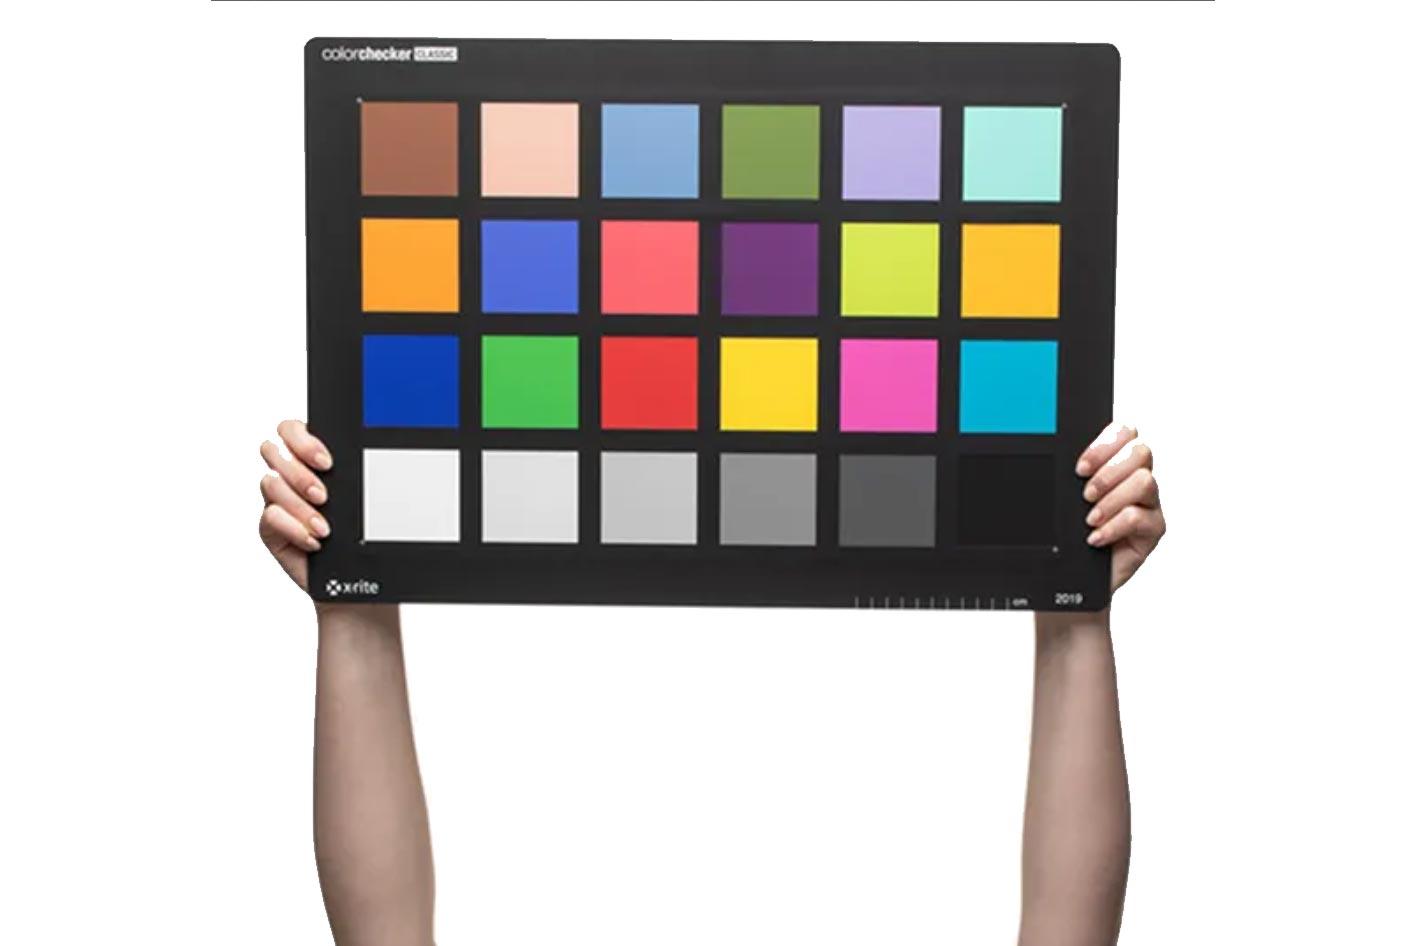 Get better colors with Filmtools' Black Friday deals